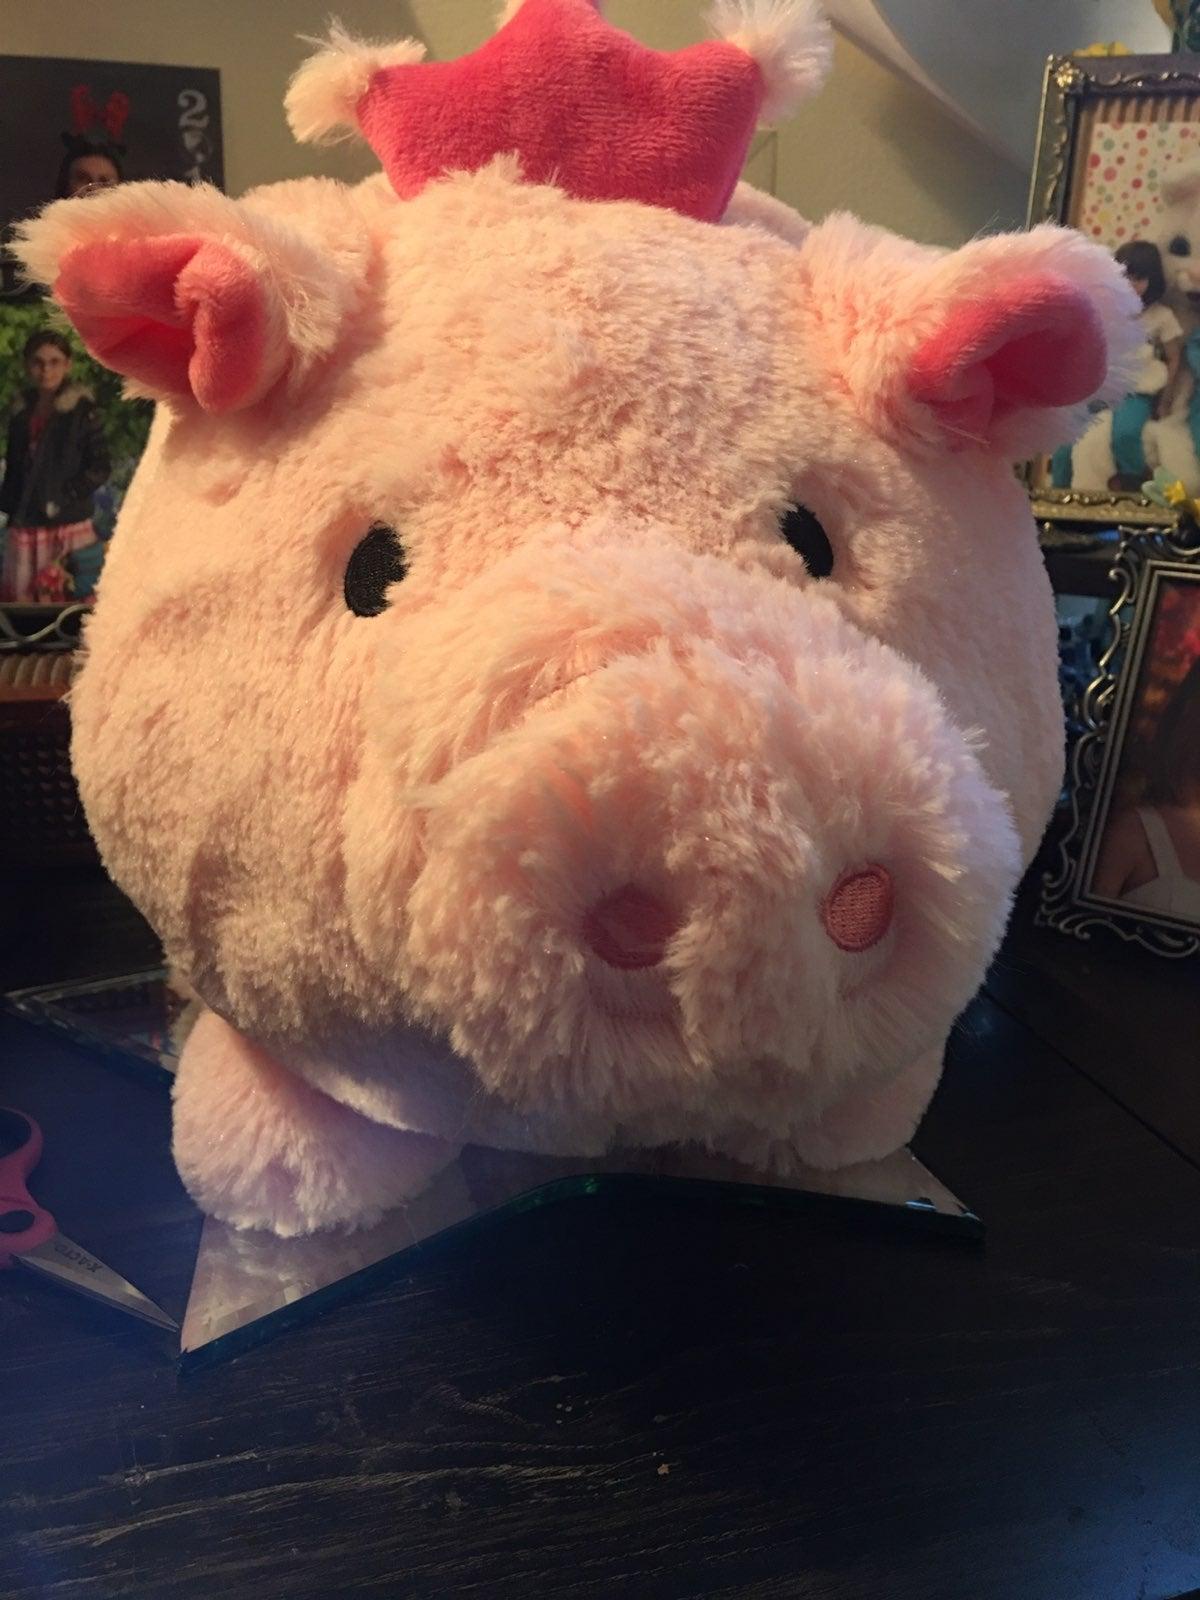 Giant furry piggy bank